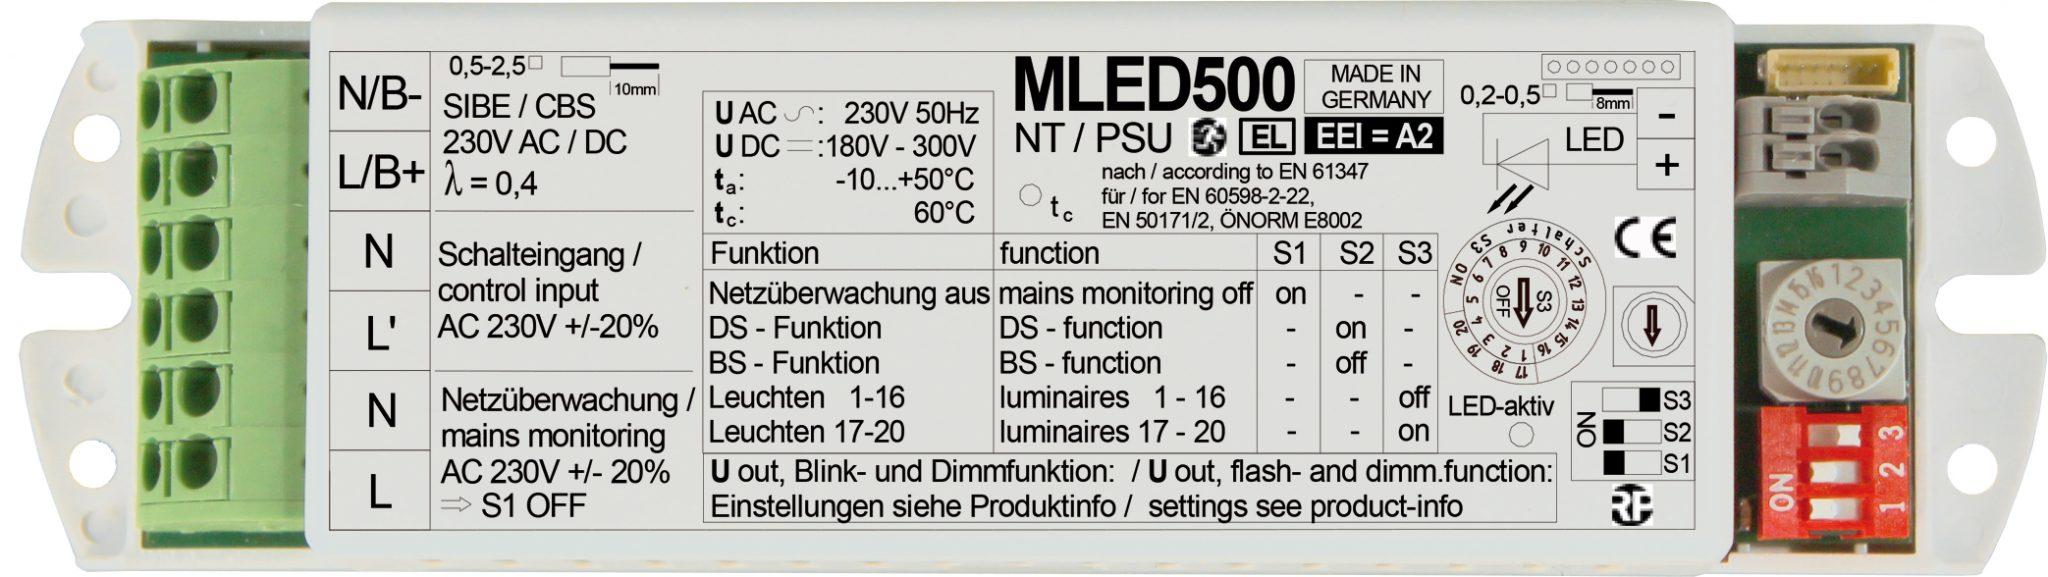 Schaltnetzteil - MLED 500